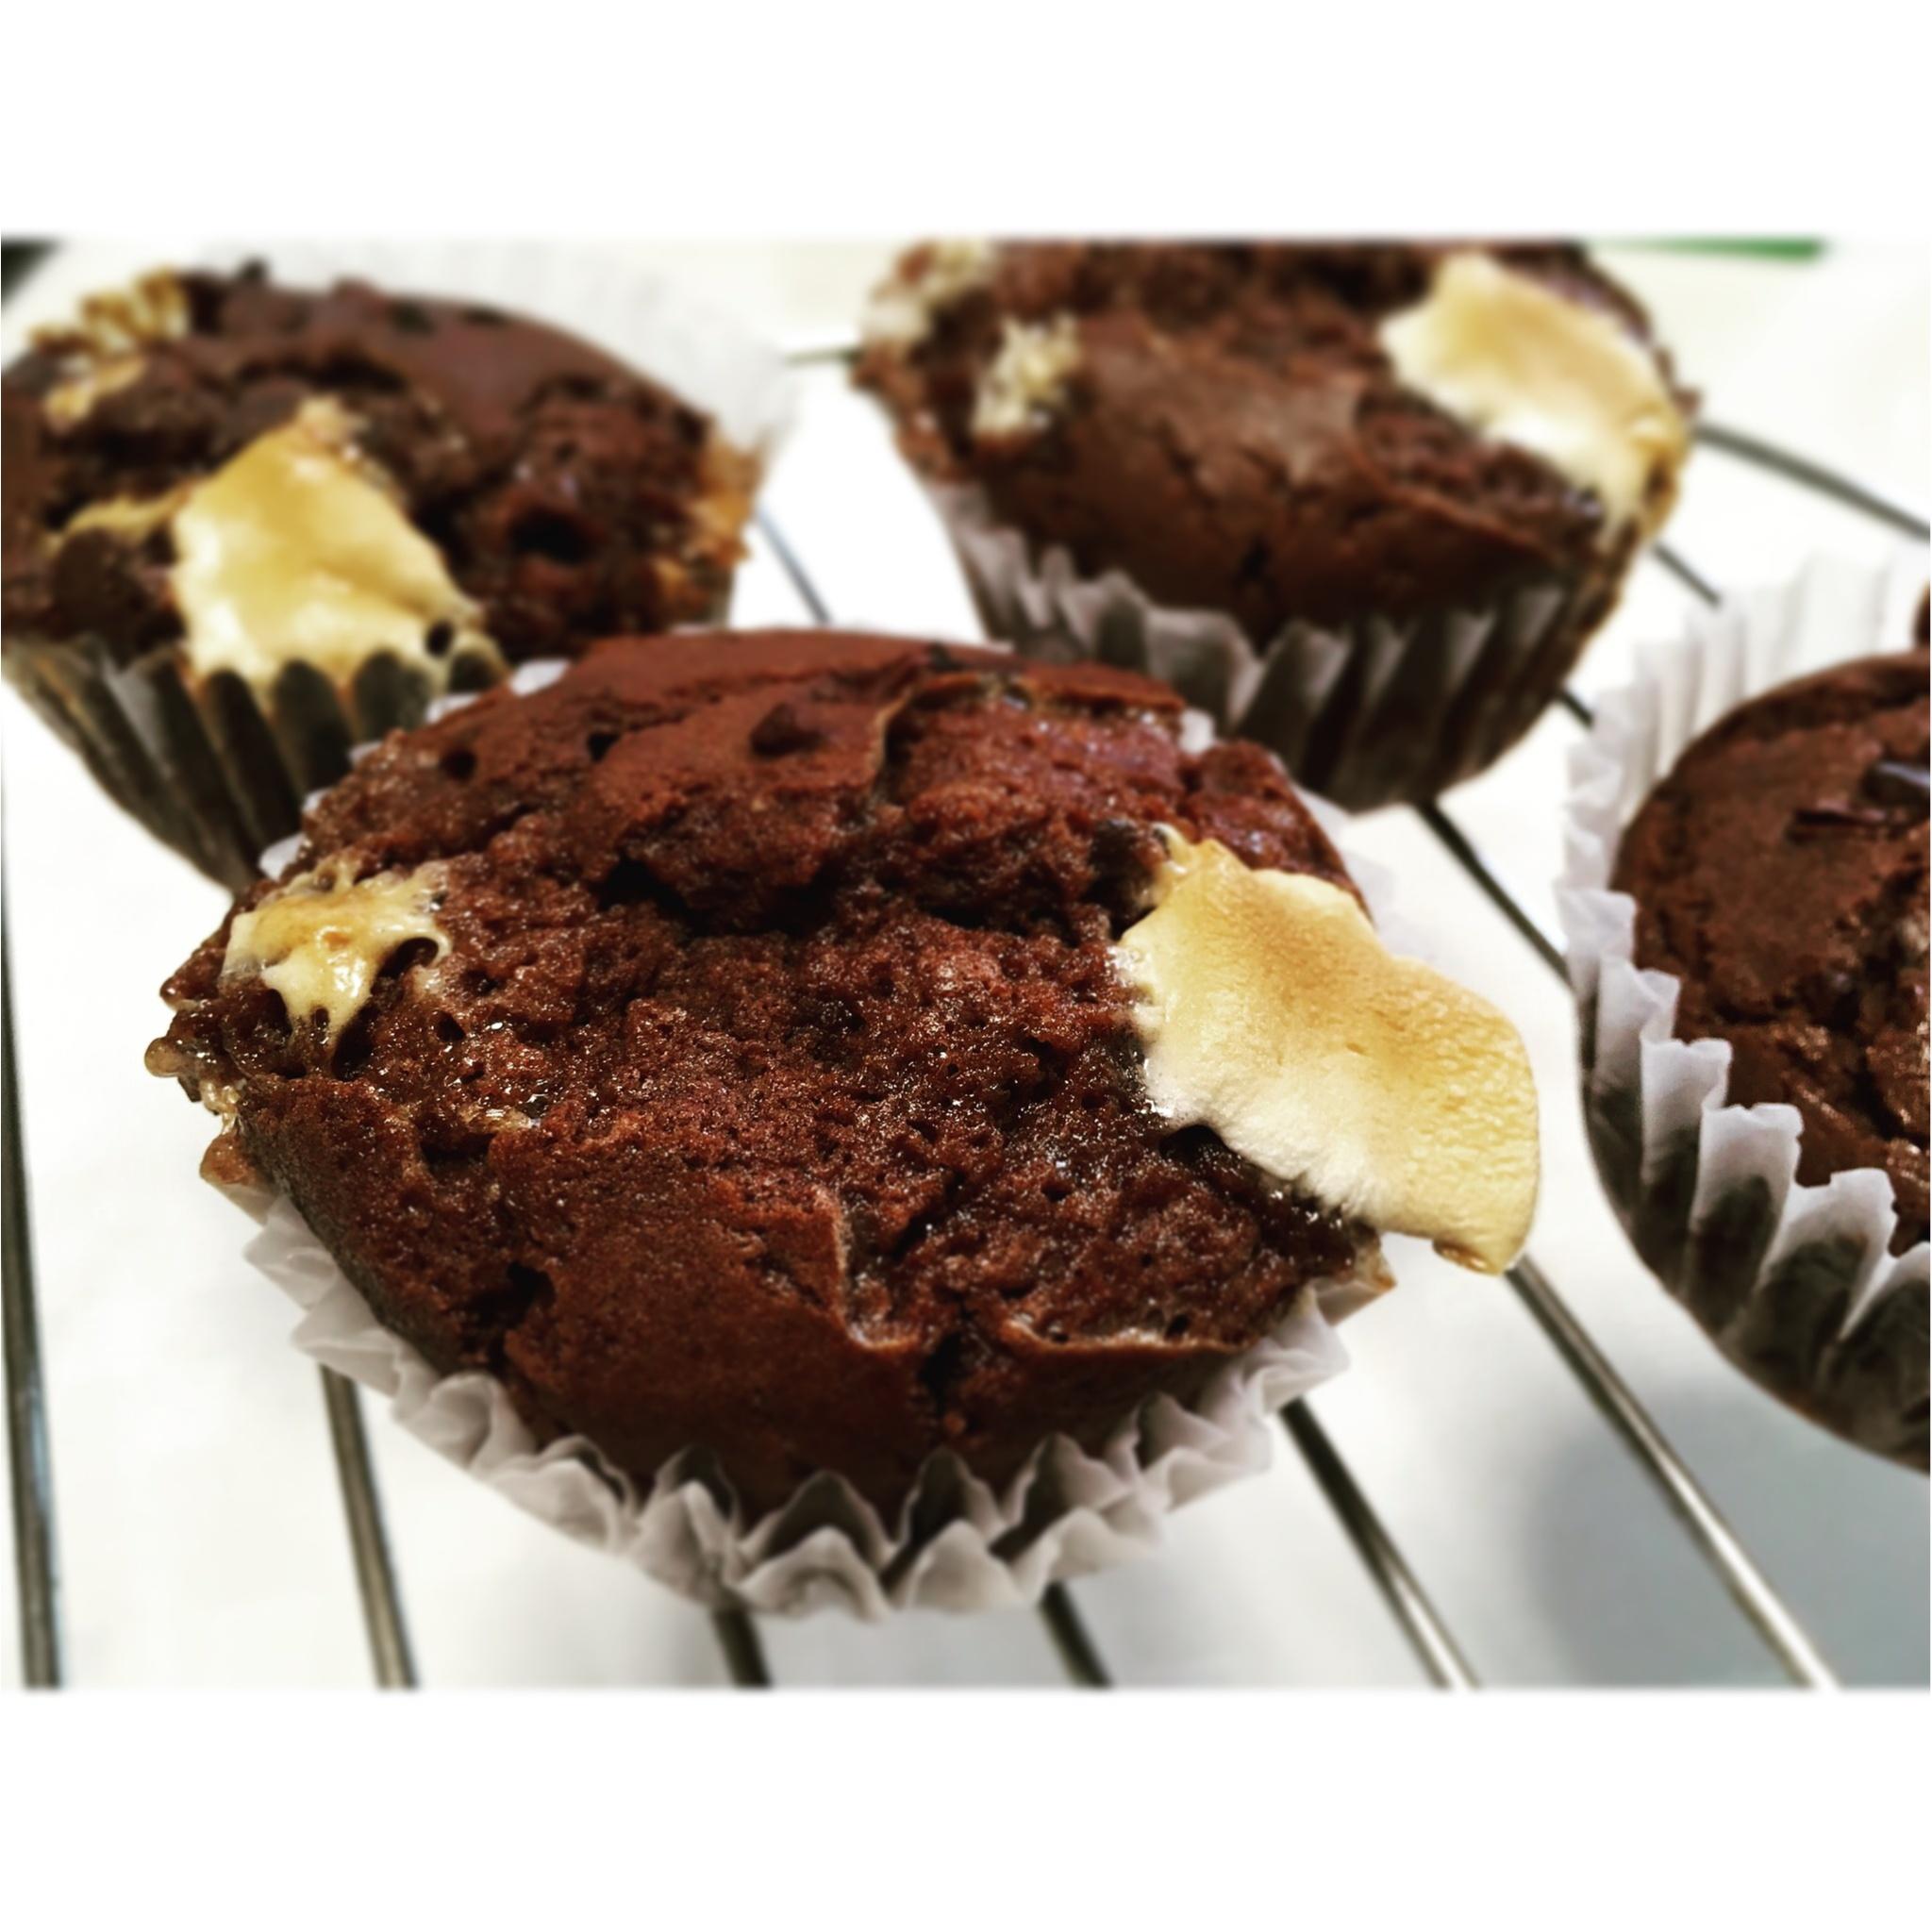 【Cooking▶お菓子作り】冬にピッタリなおやつ☺マシュマロたっぷり体に優しい米粉のココアマフィンの作り方☺︎_1